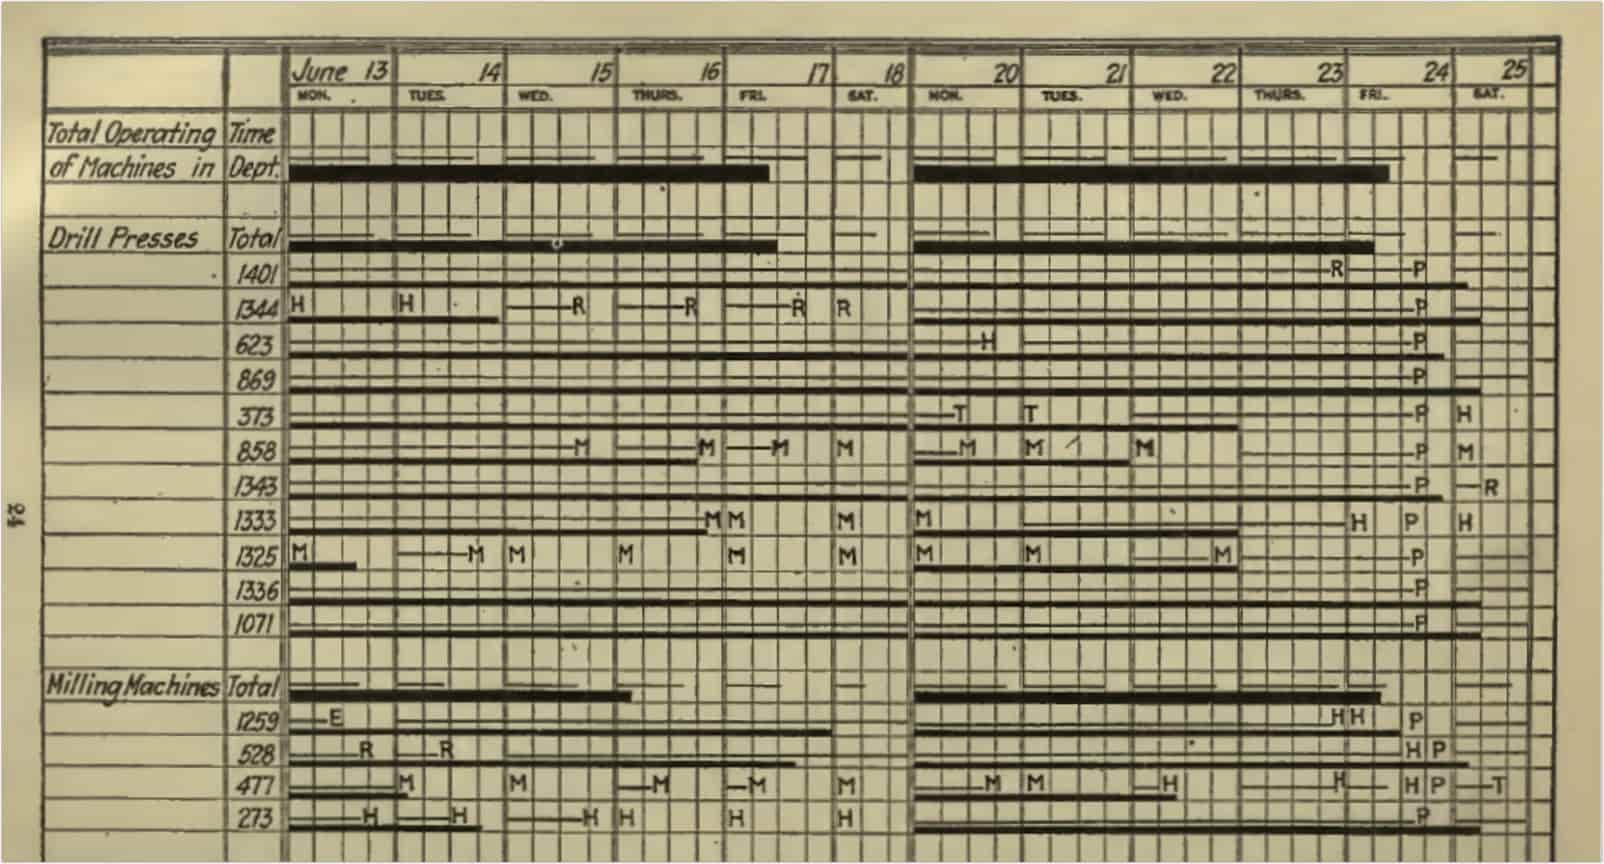 Mastering your production calendar free gantt chart excel template free gantt chart excel template classic gantt chart example studiobinder nvjuhfo Choice Image